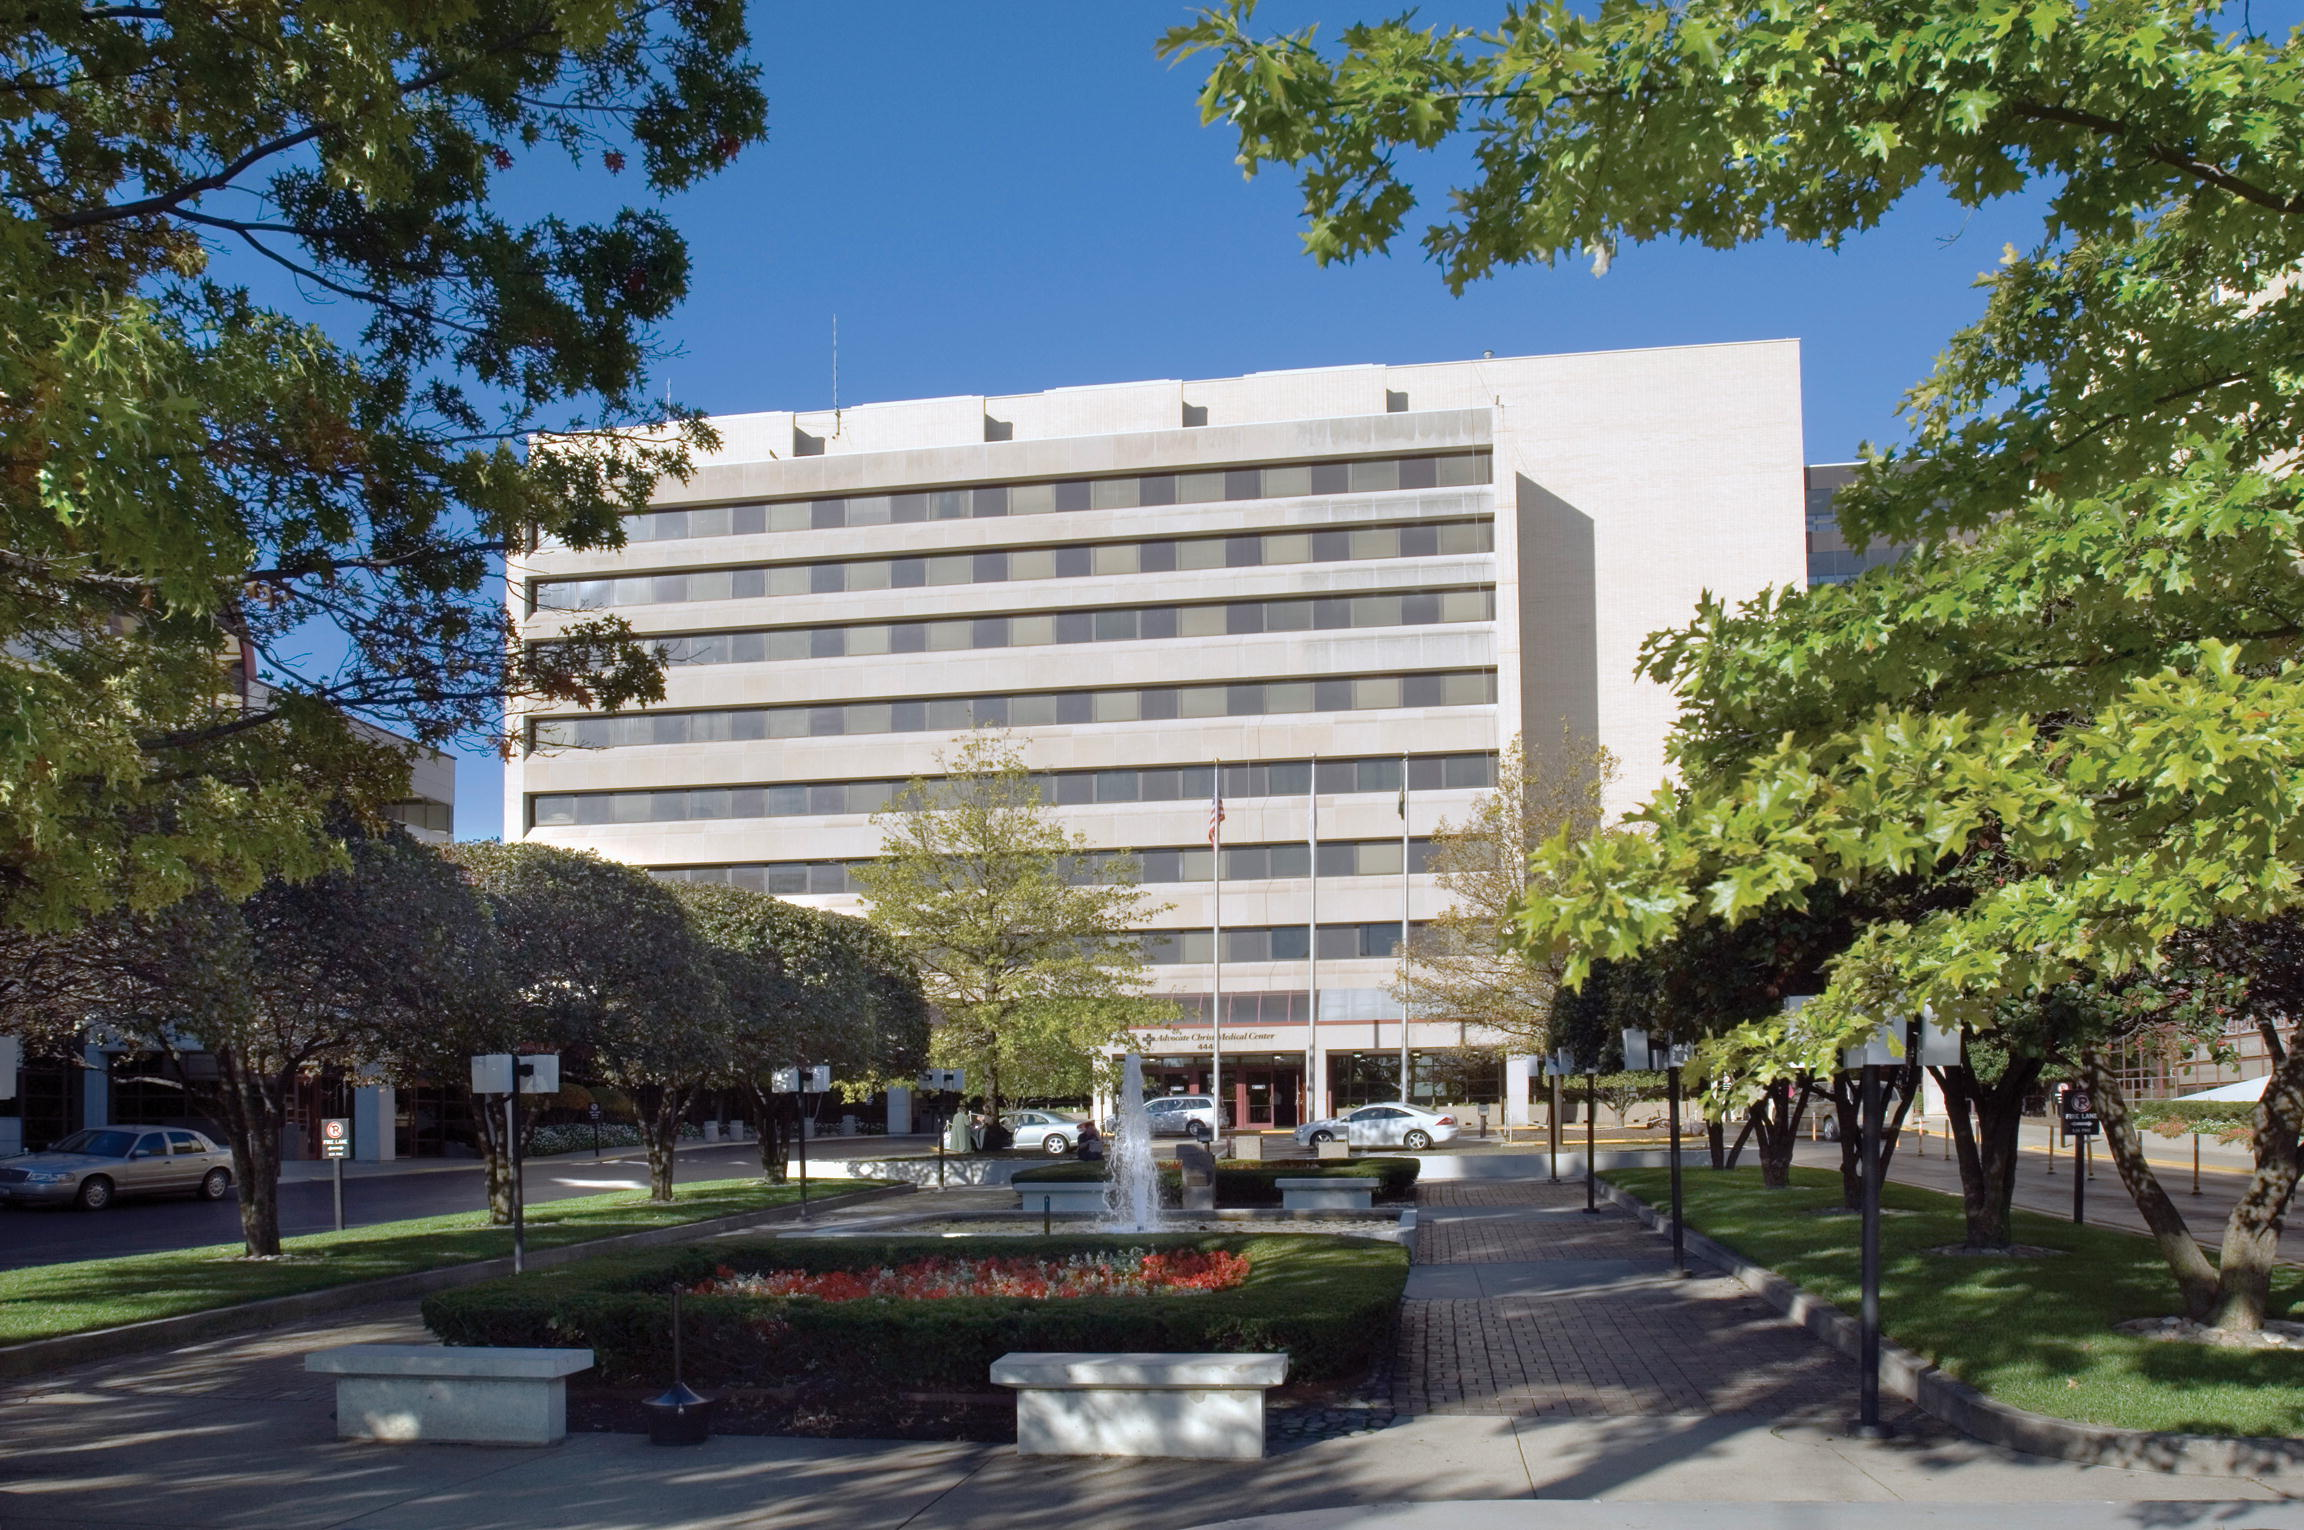 Advocate Christ Medical Center